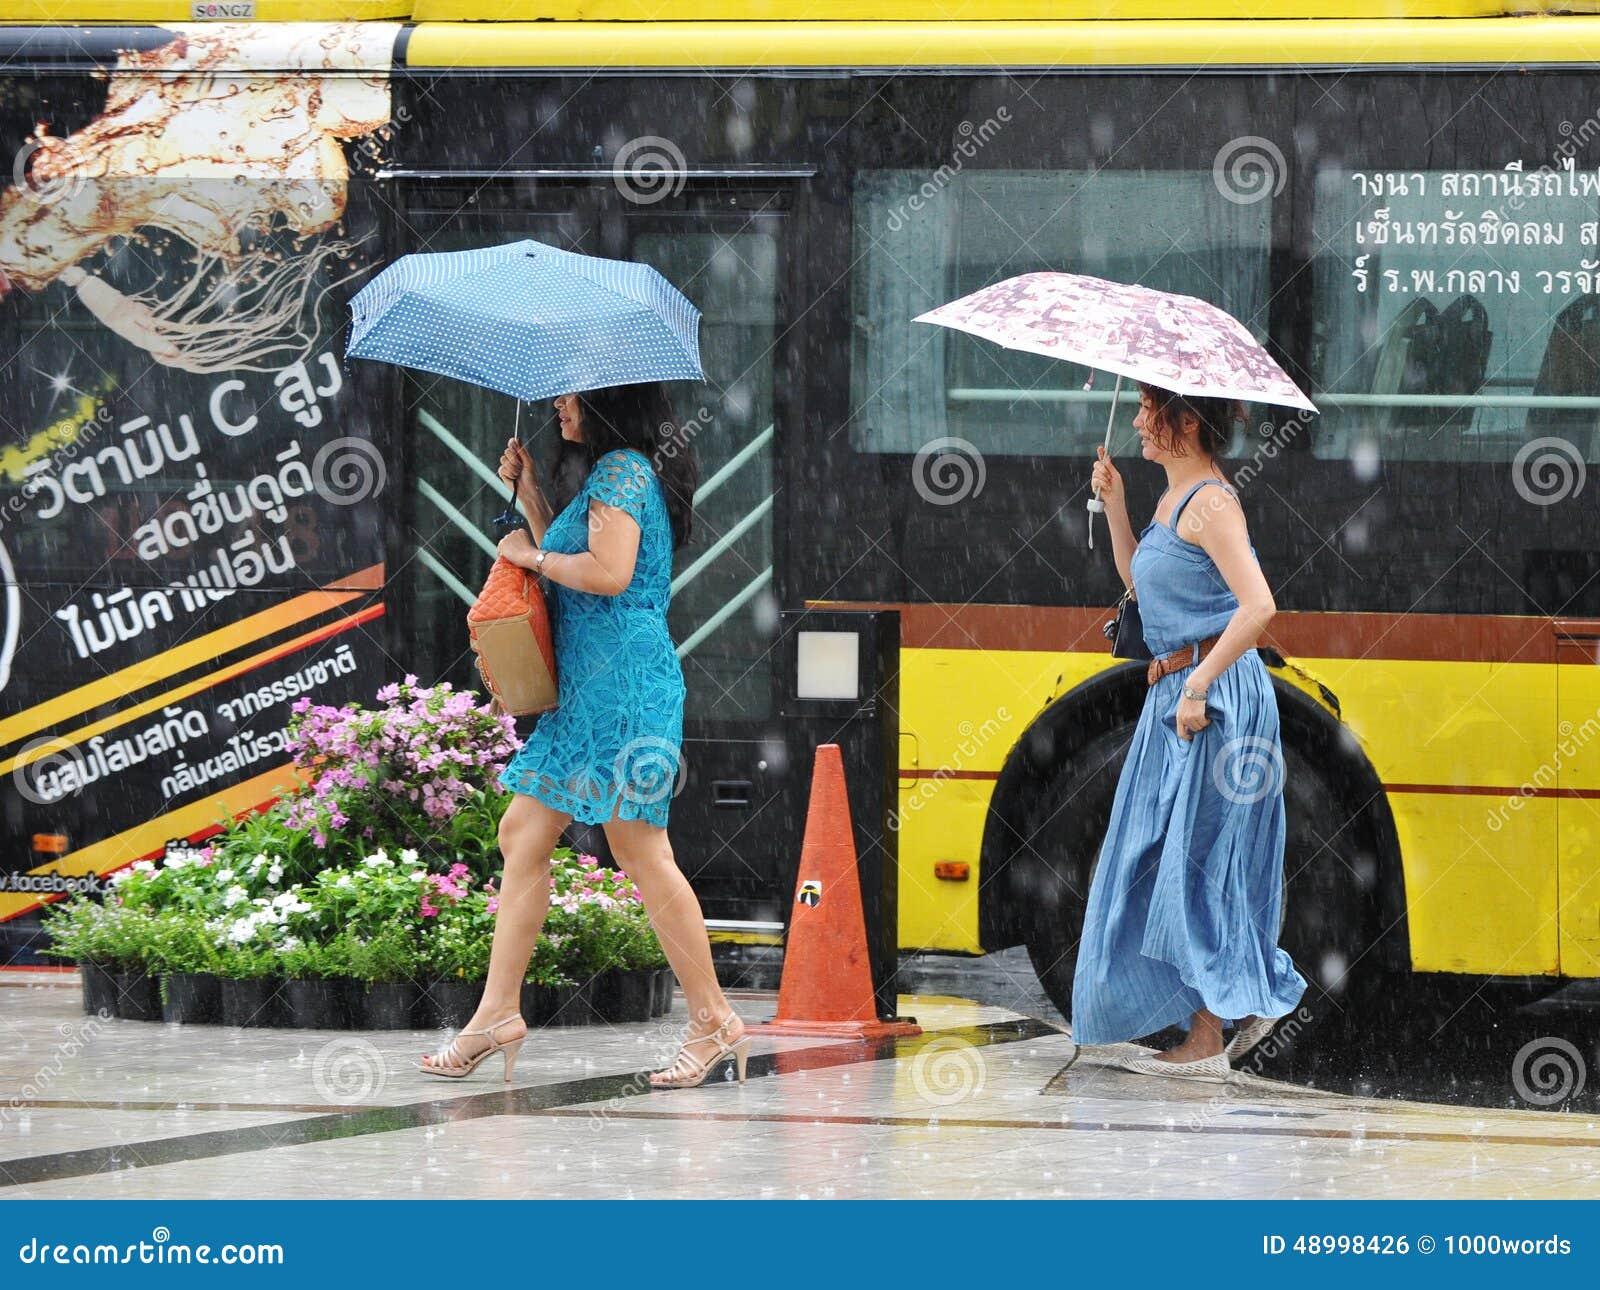 Bangkok Thailand August 2017 low season. Rainy season. # ...